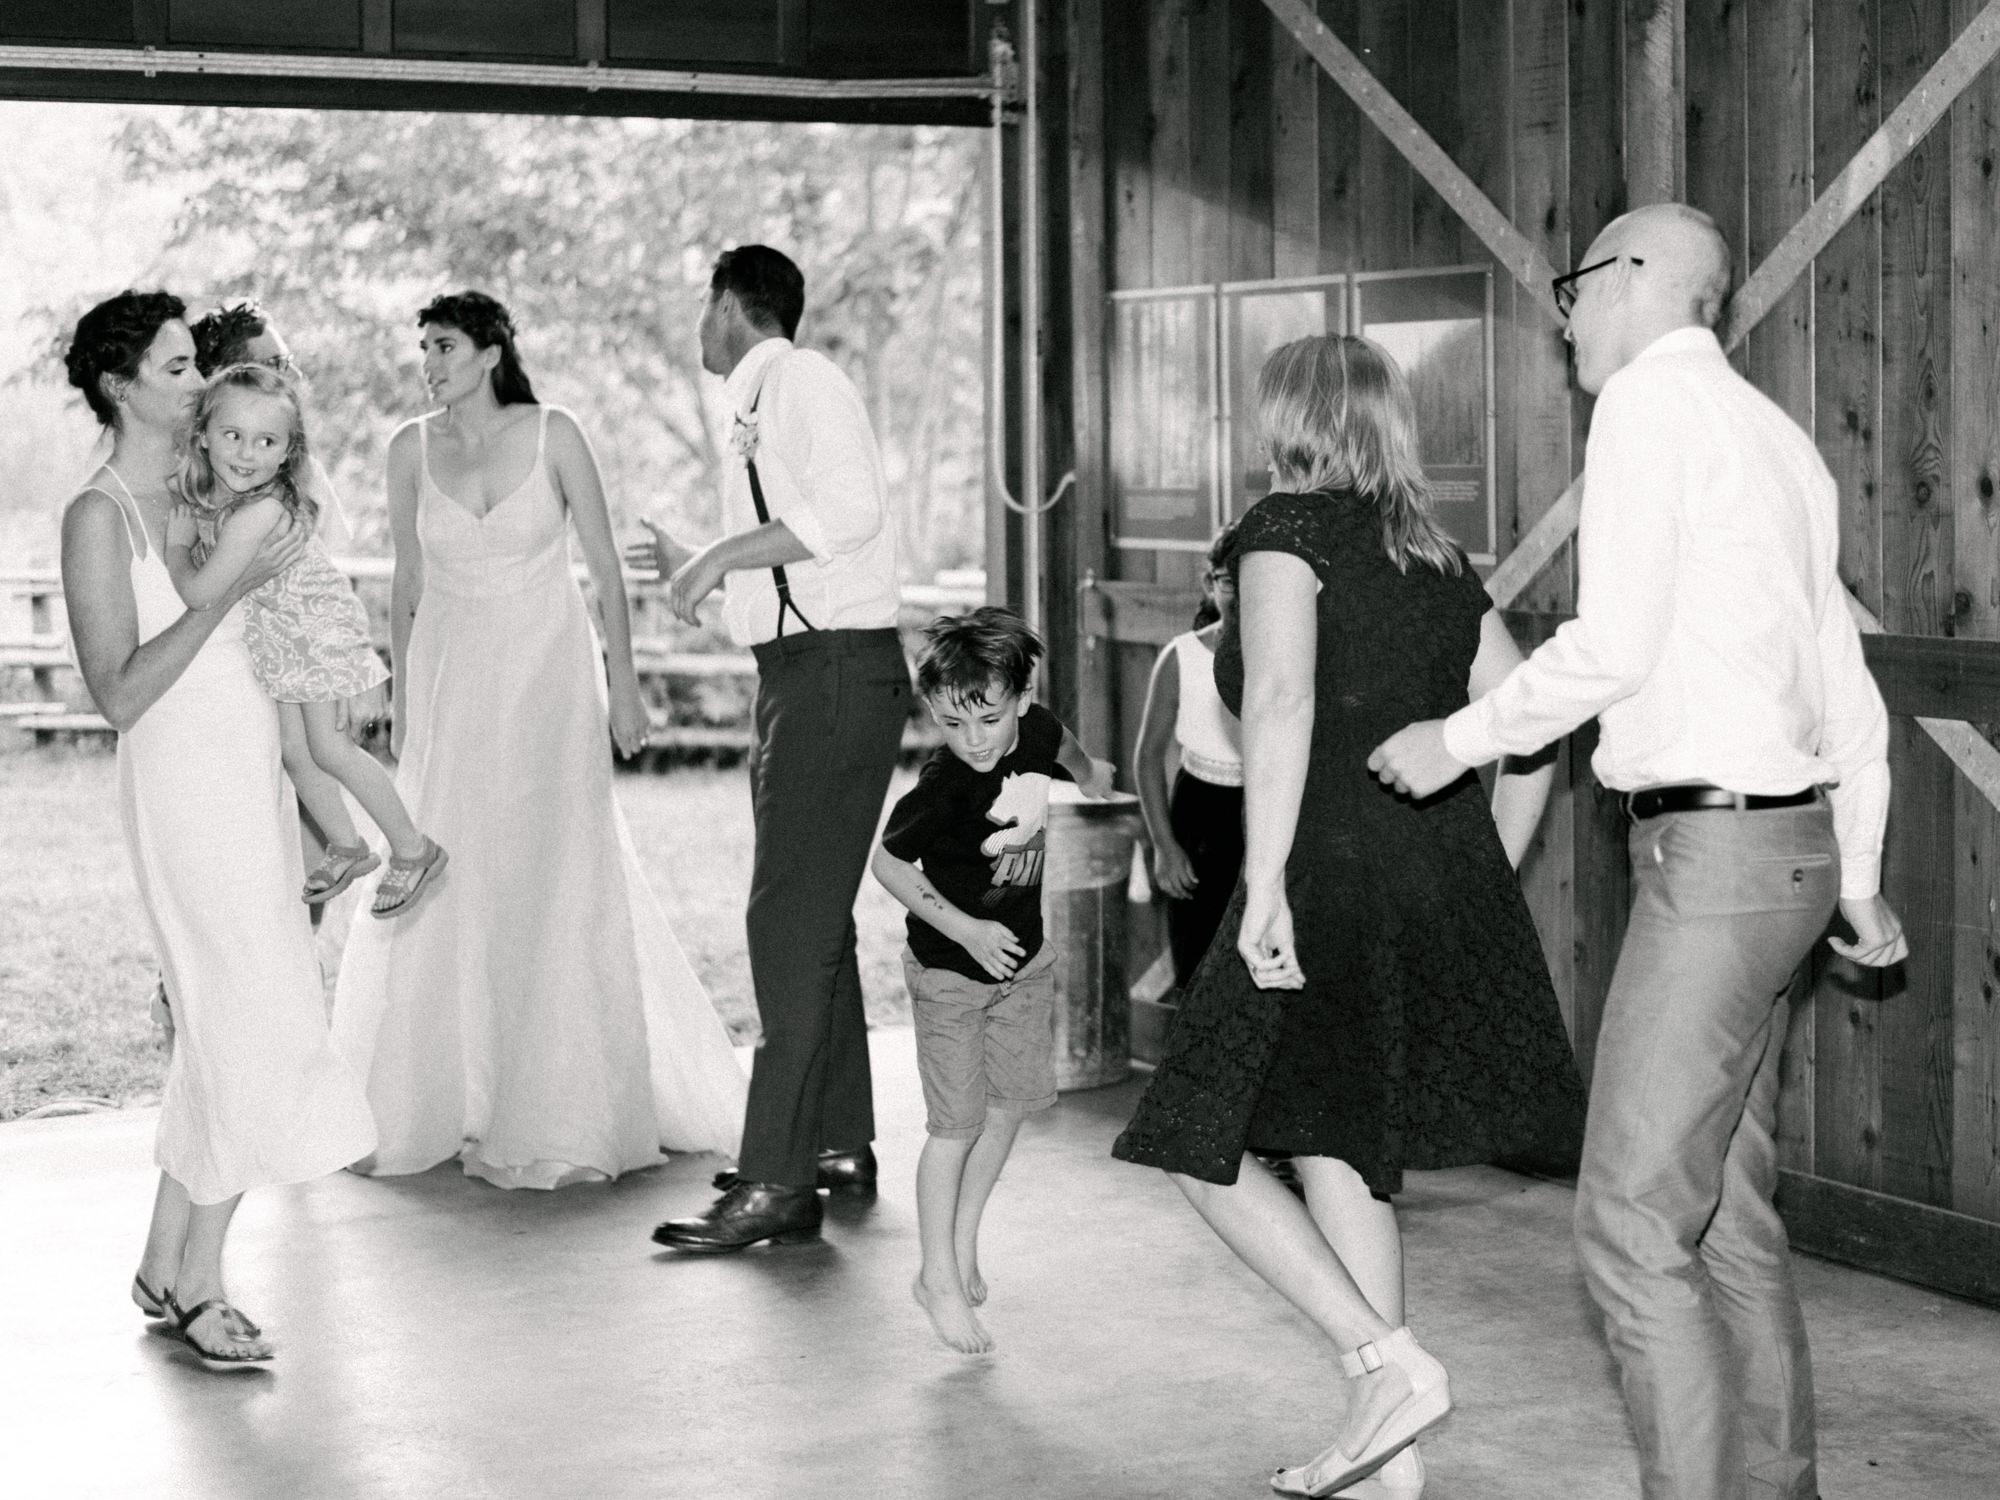 Brian Whitt Photography-Portland-Wedding-Photographer-BMW-141226-untitled-0286.jpg